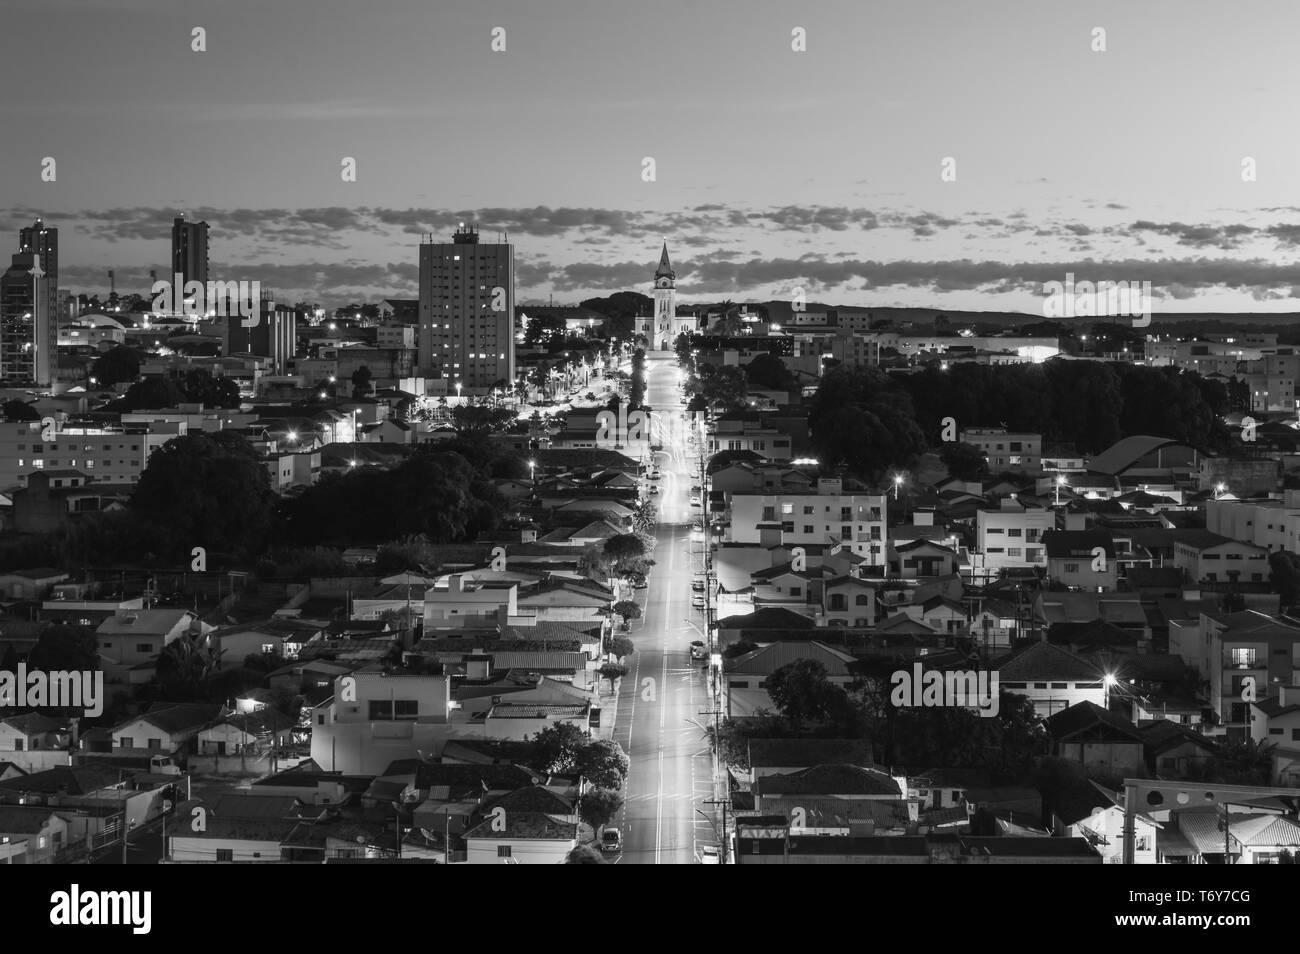 Cityscape of Araxá, MG, Brazil in the evening - Stock Image